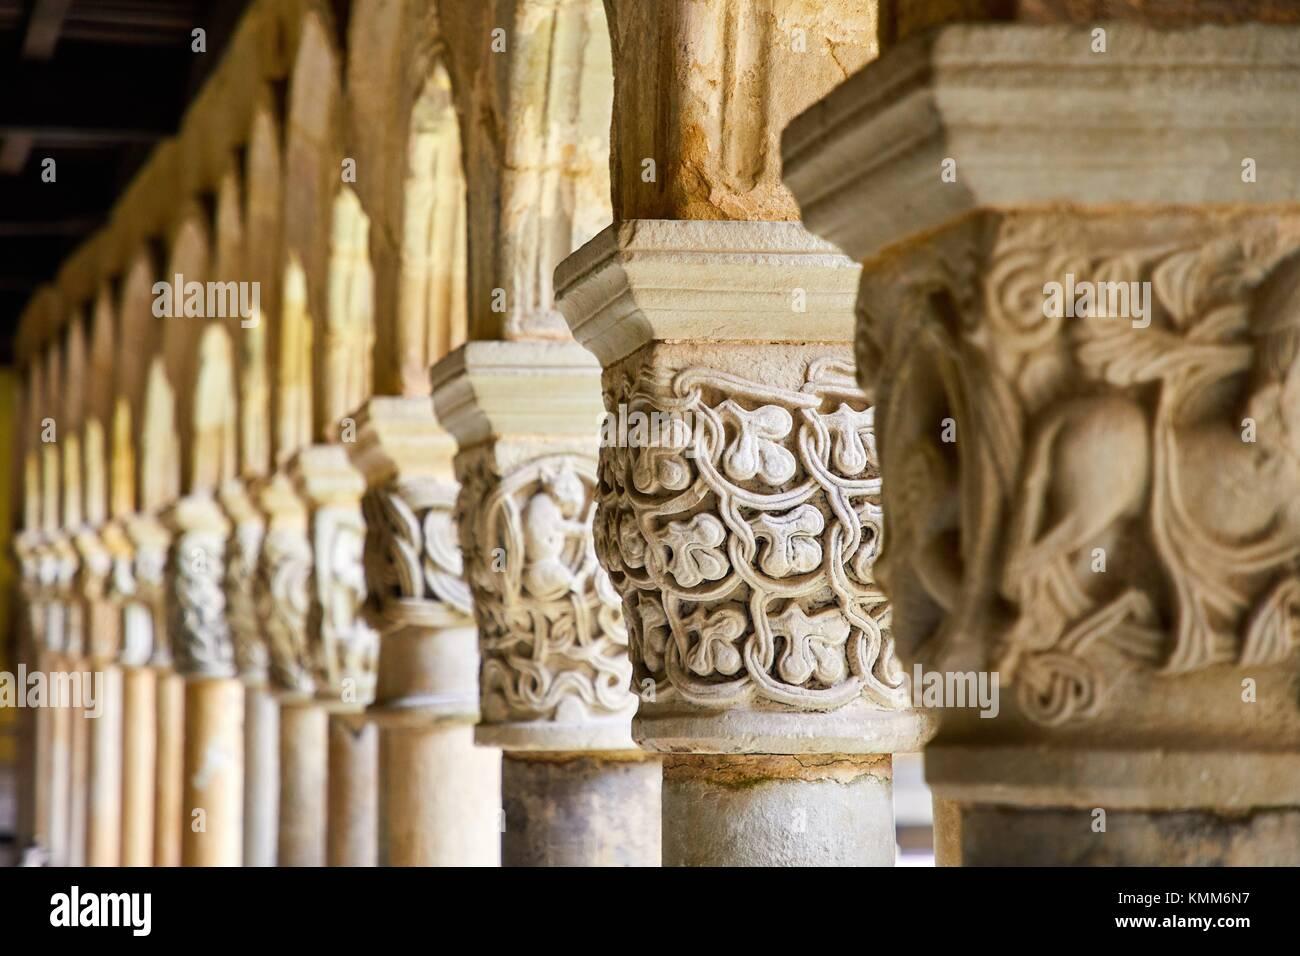 Cloister of the Santa Juliana collegiate church, Santillana del Mar, Cantabria, Spain, Europe - Stock Image